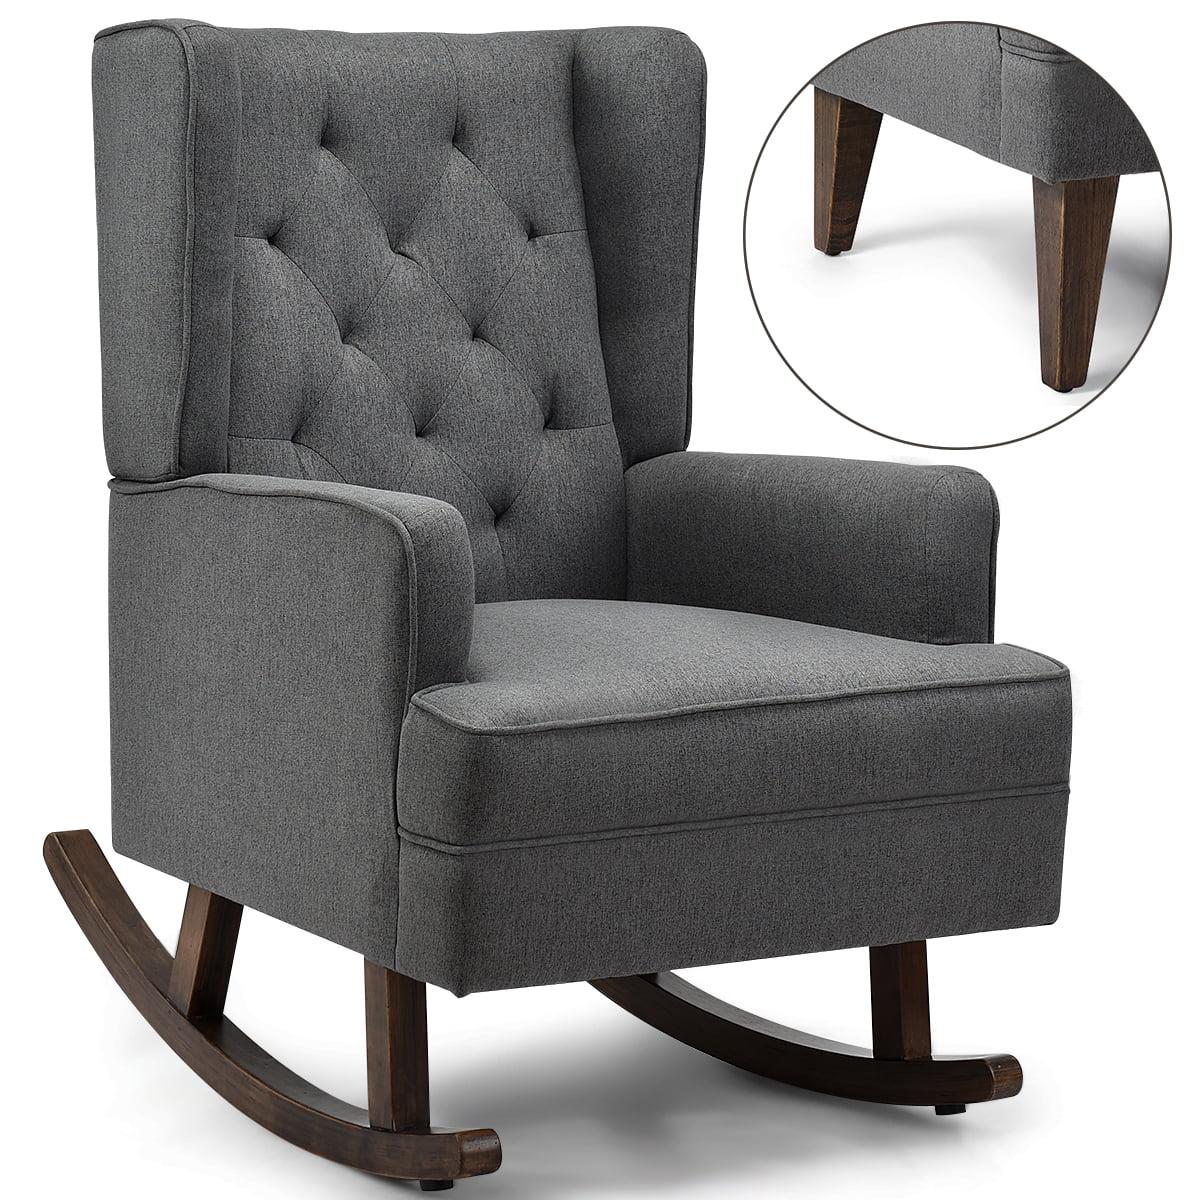 Costway 2 In 1 Tufted Rocking Chair Wingback Lounge Leisure Armchair Fabric Rocker Grey Walmart Com Walmart Com